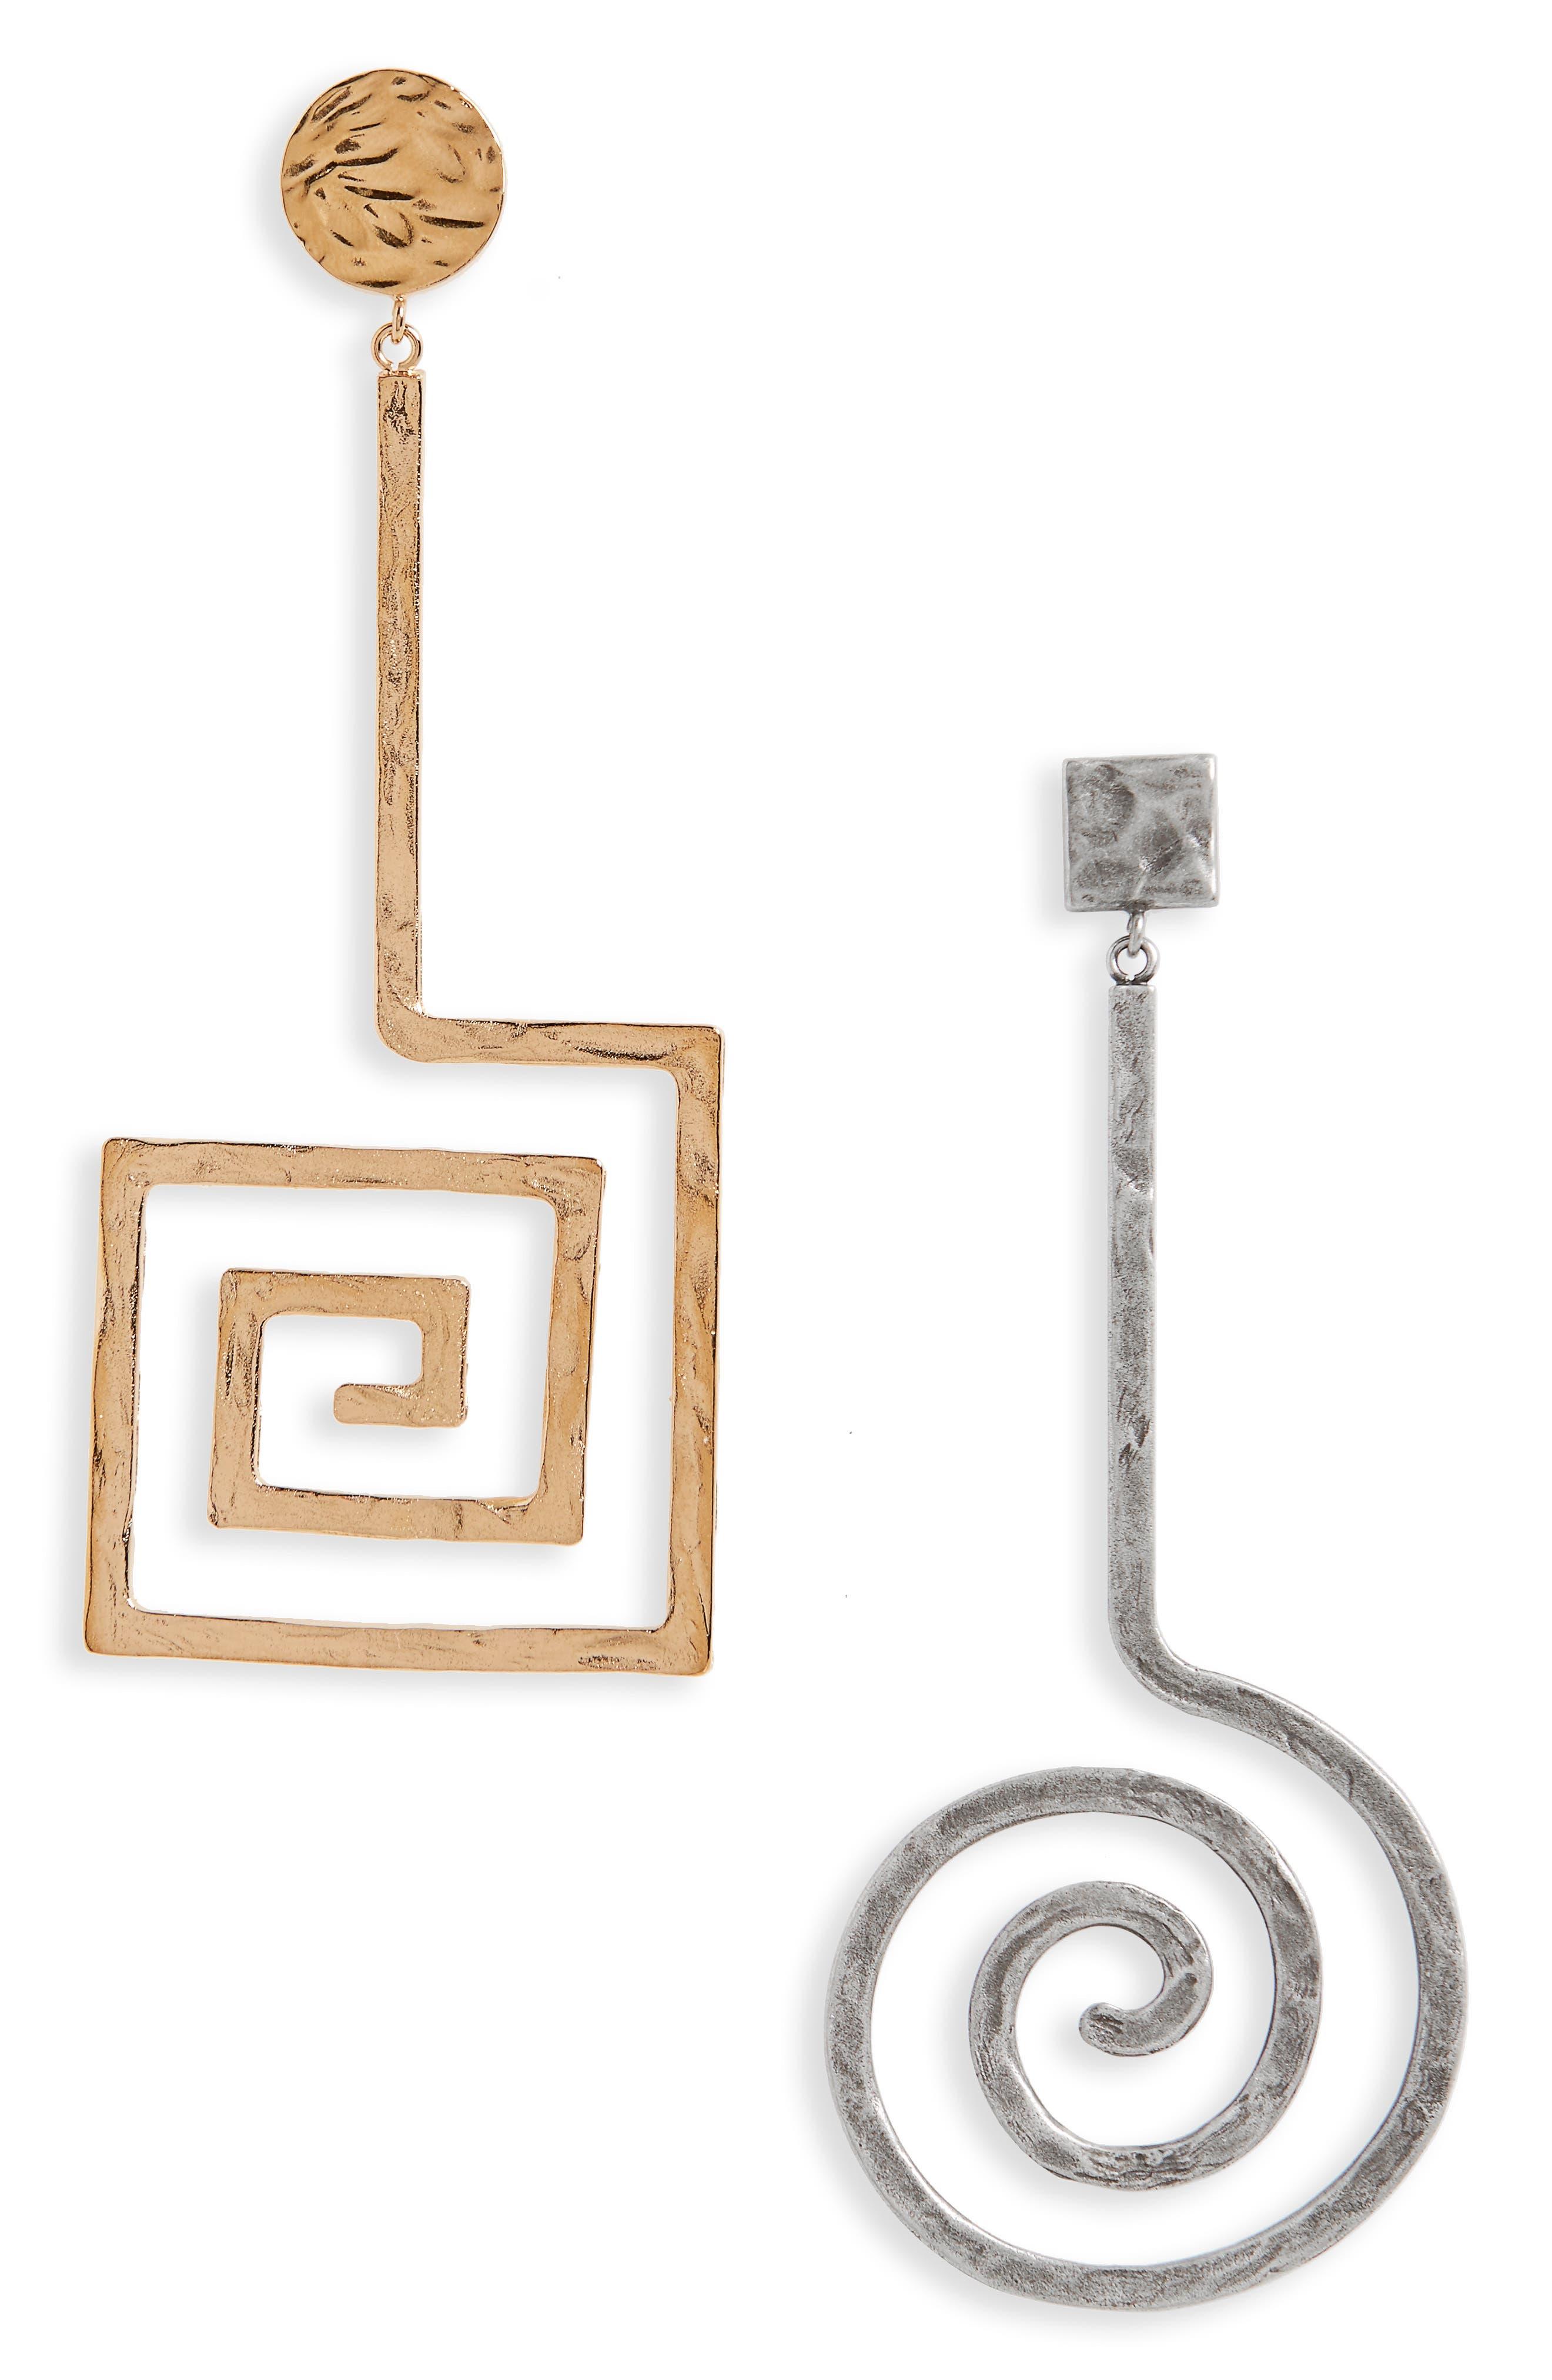 La Spirale Mismatched Statement Earrings,                         Main,                         color, Gold/ Silver